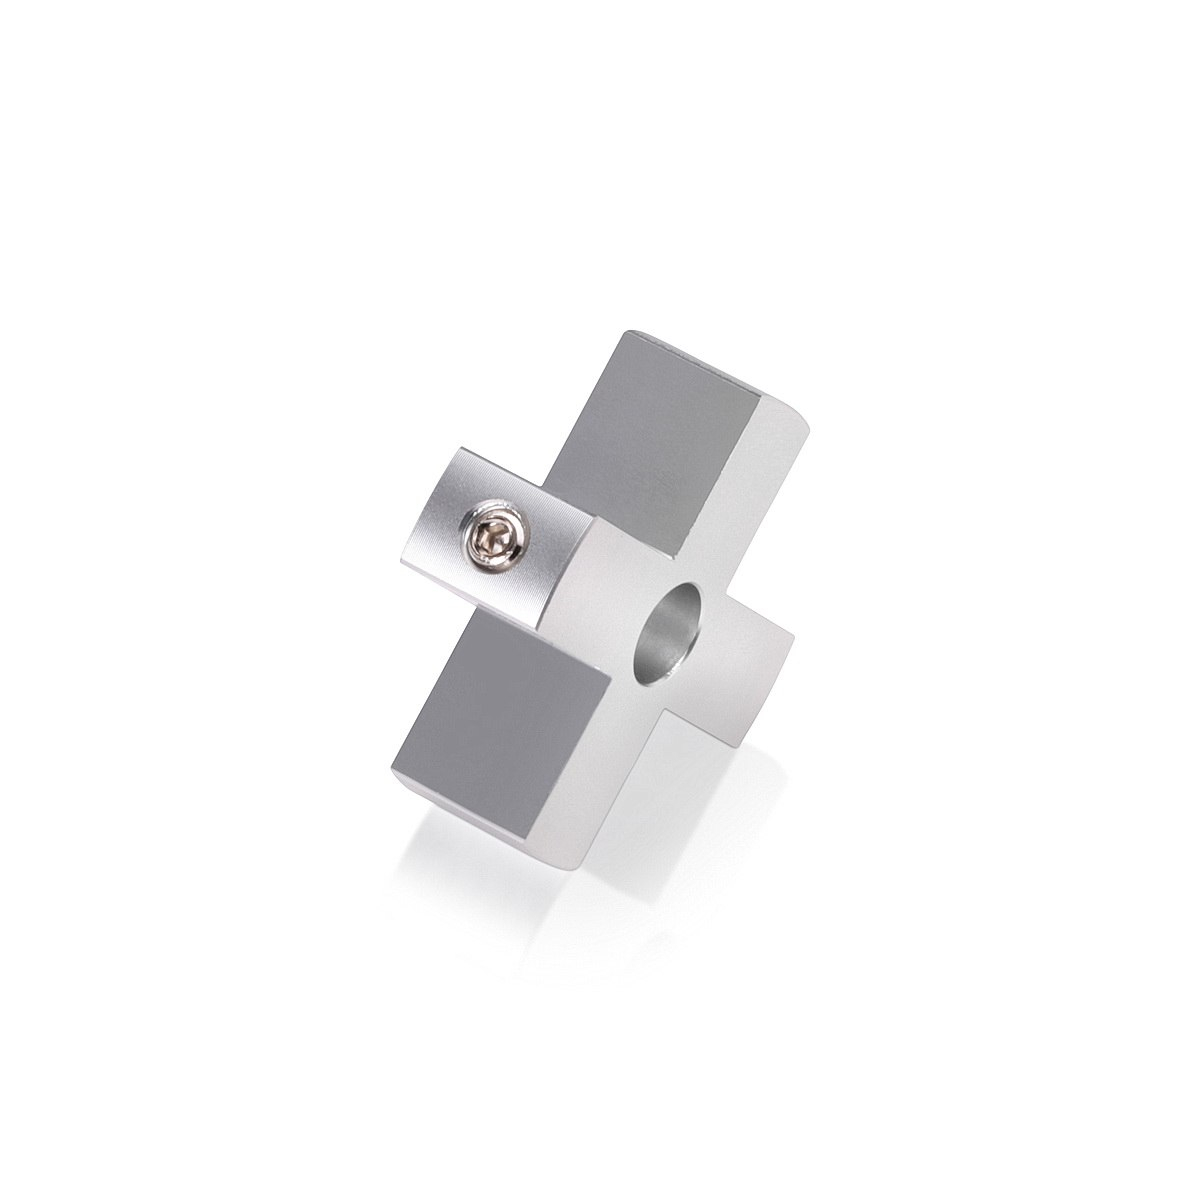 4-Way Standoffs Hub, Diameter: 1 1/2'', Thickness: 1/2'', Clear Anodized Aluminum